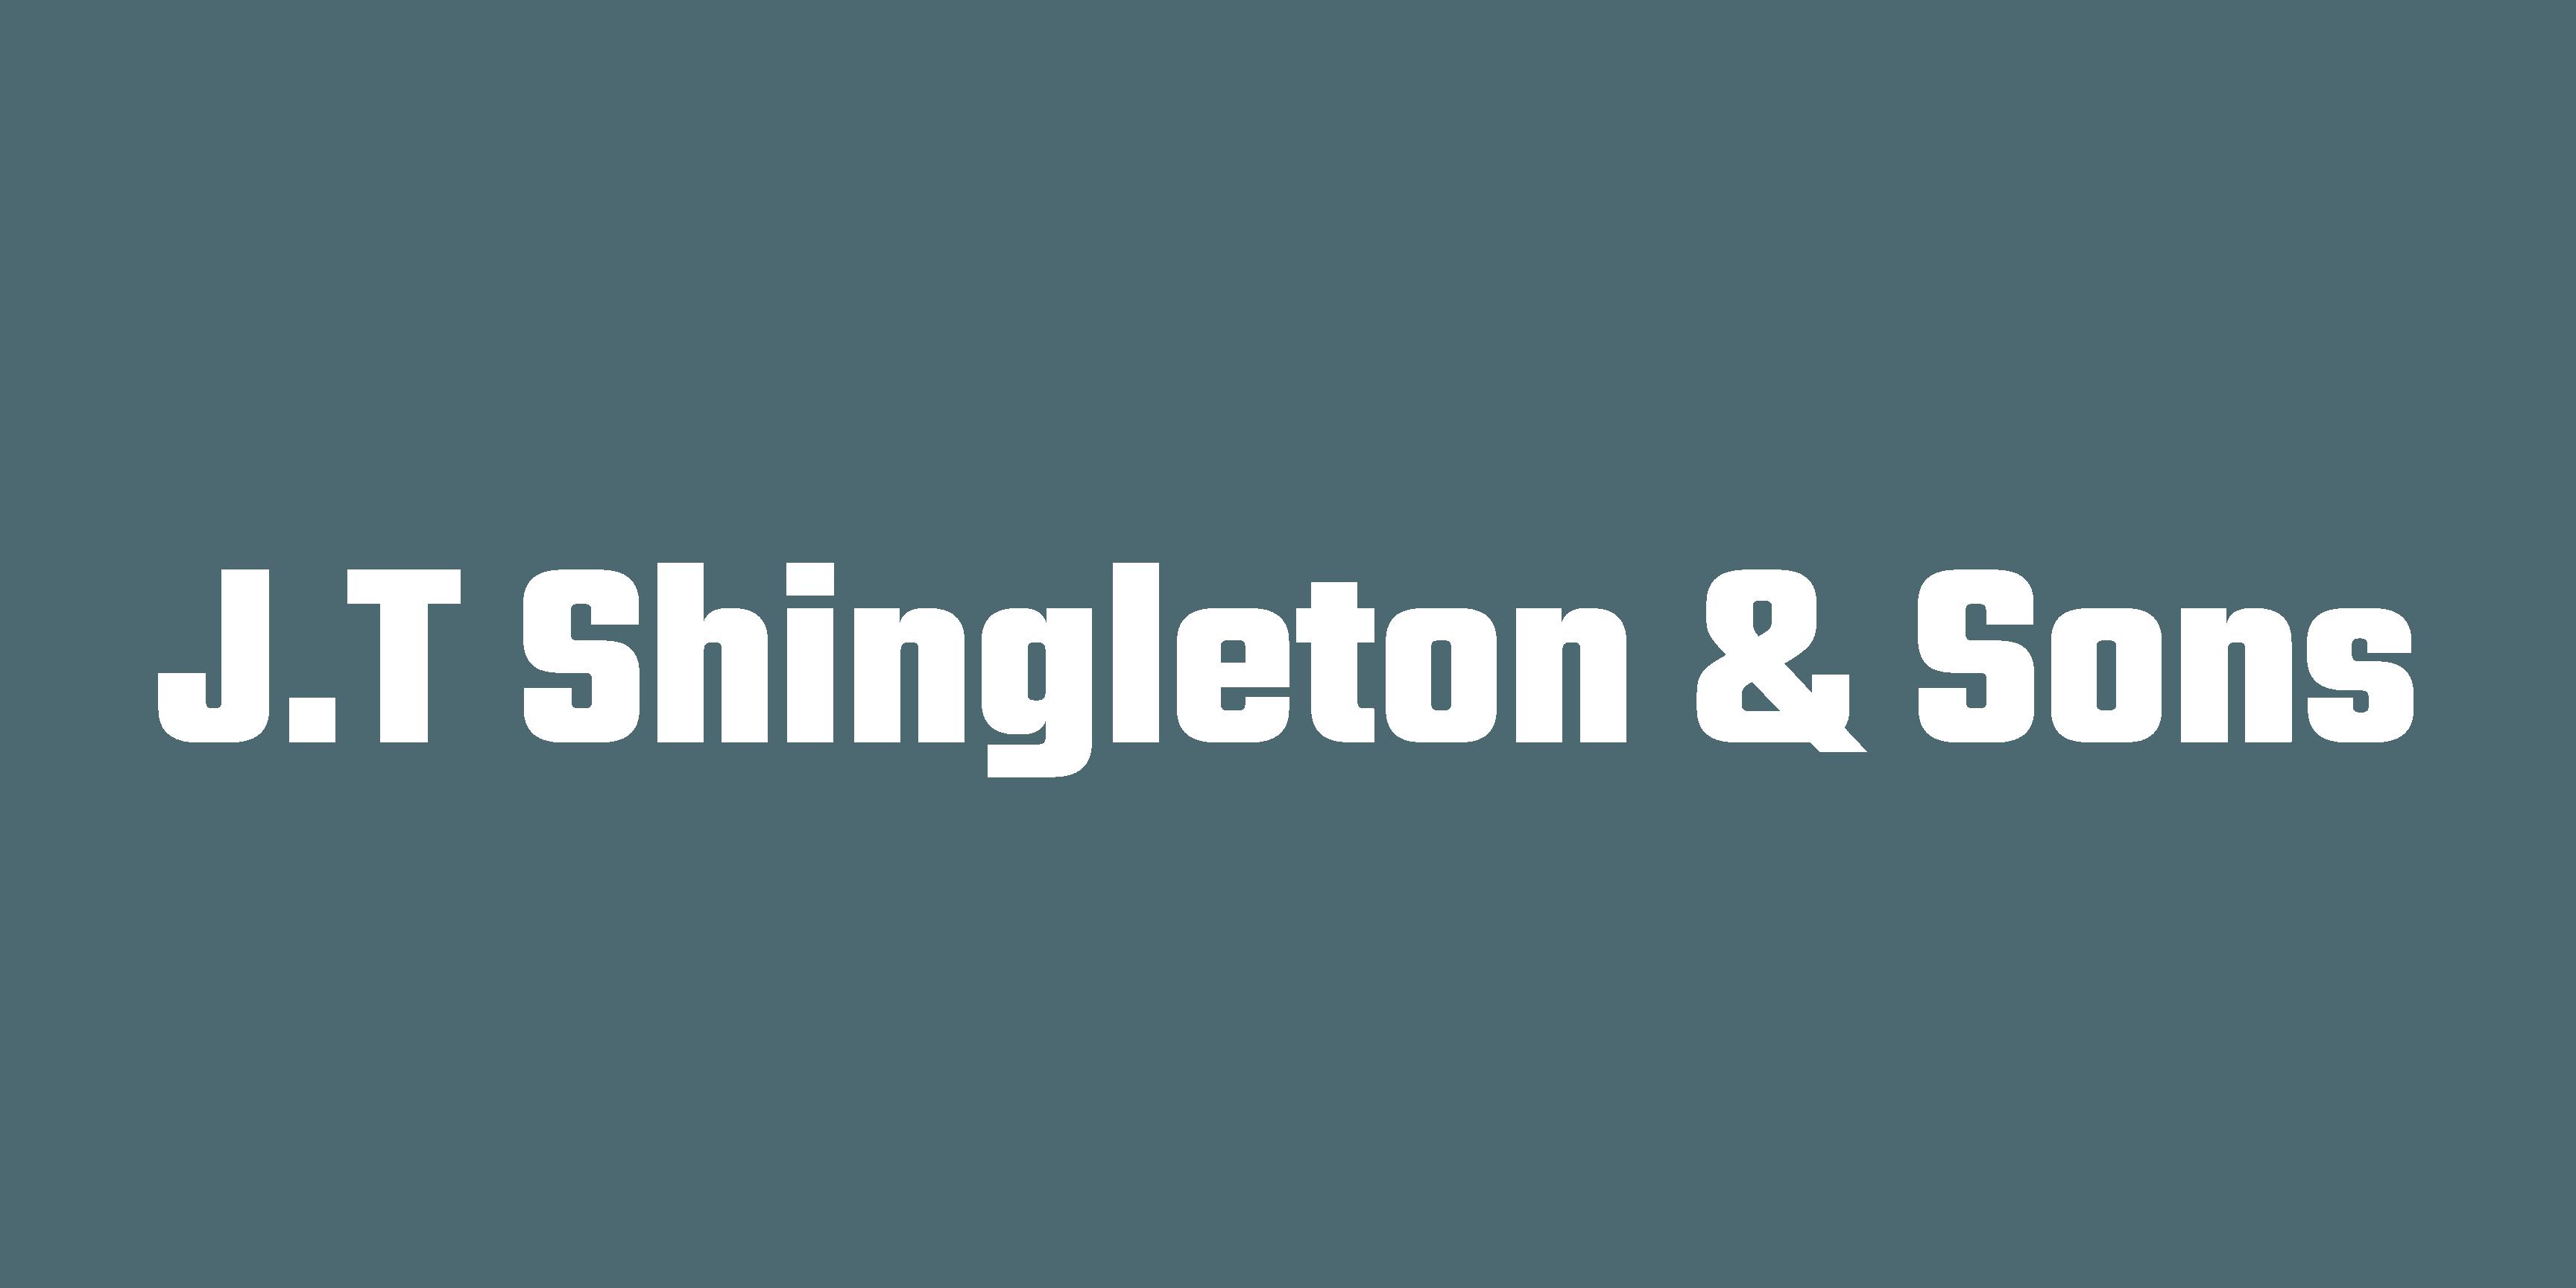 J.T. Shingleton & Sons